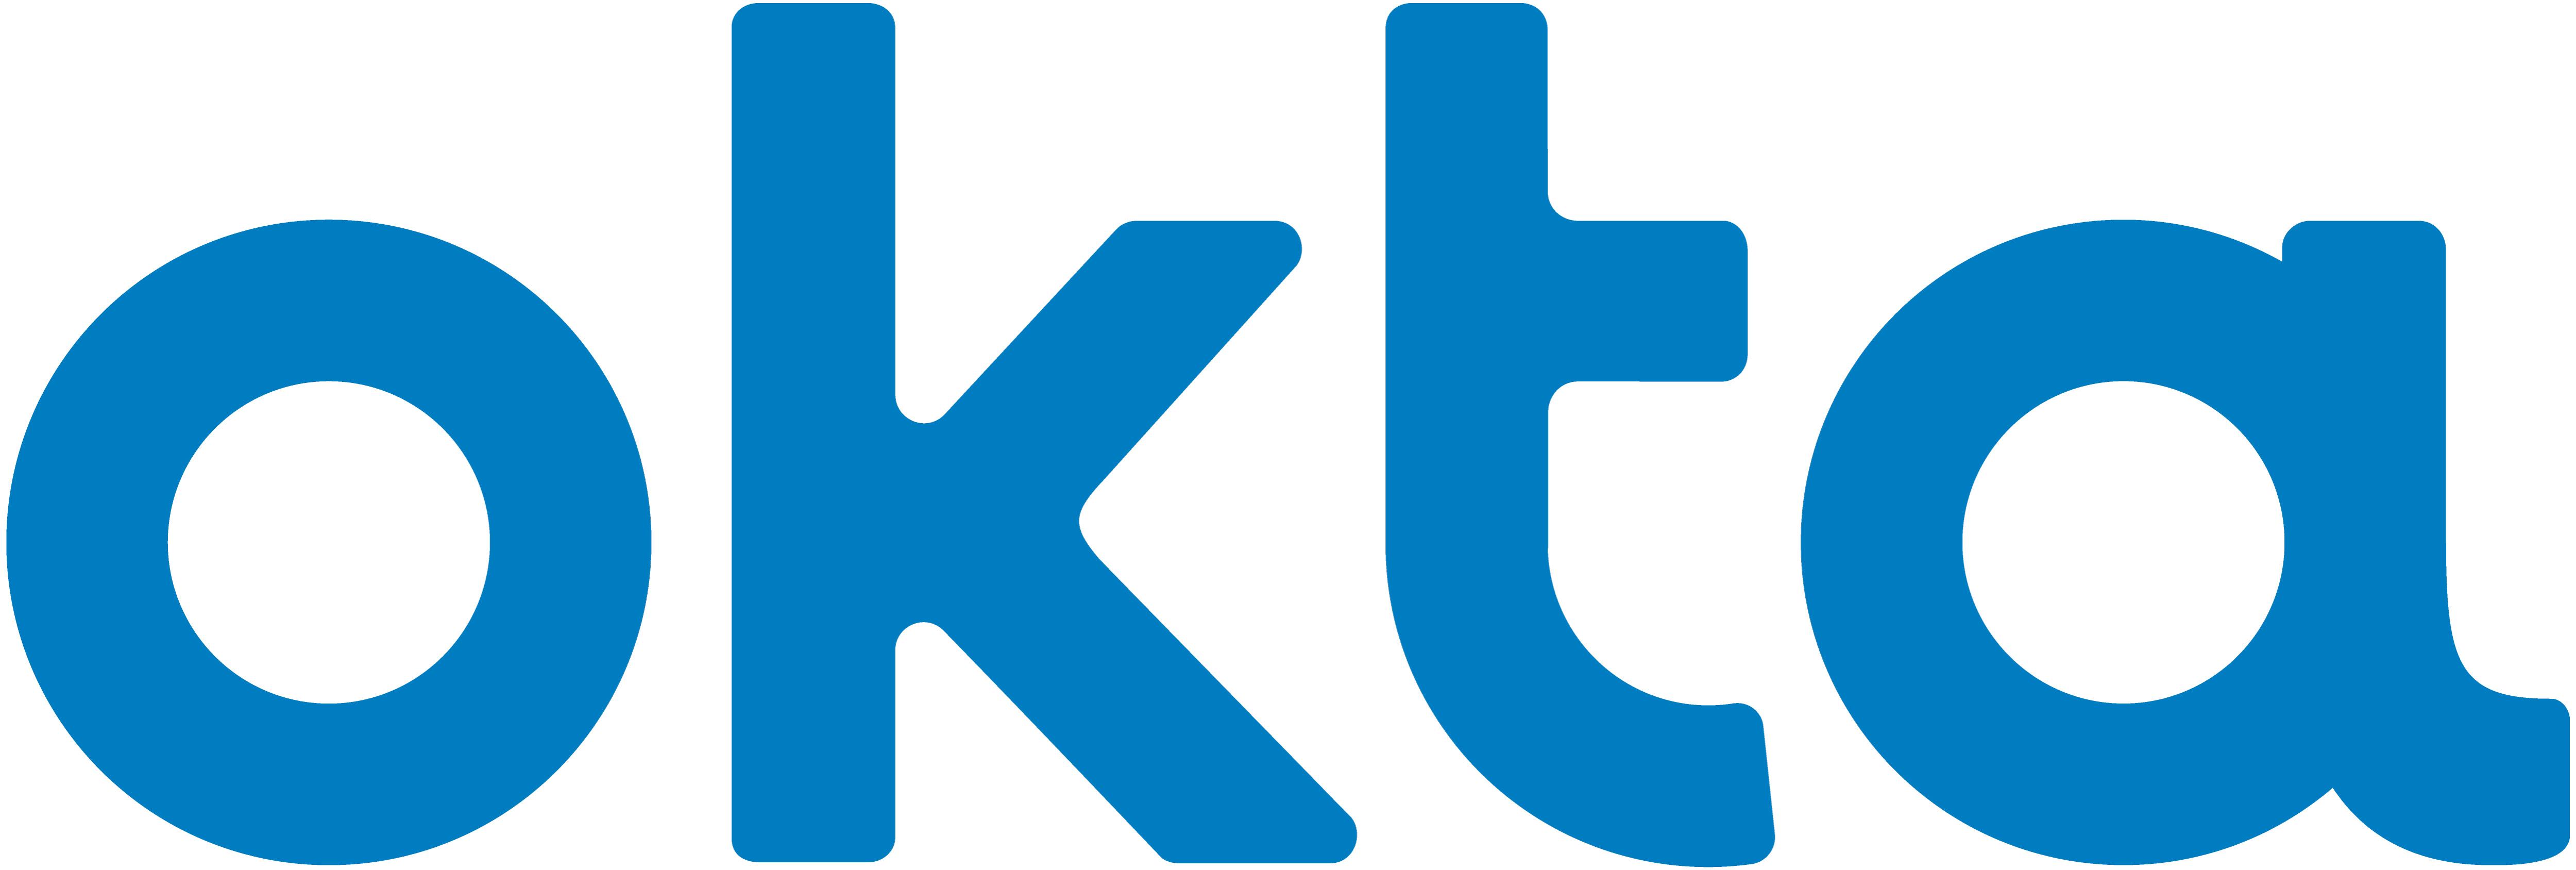 the word Okta